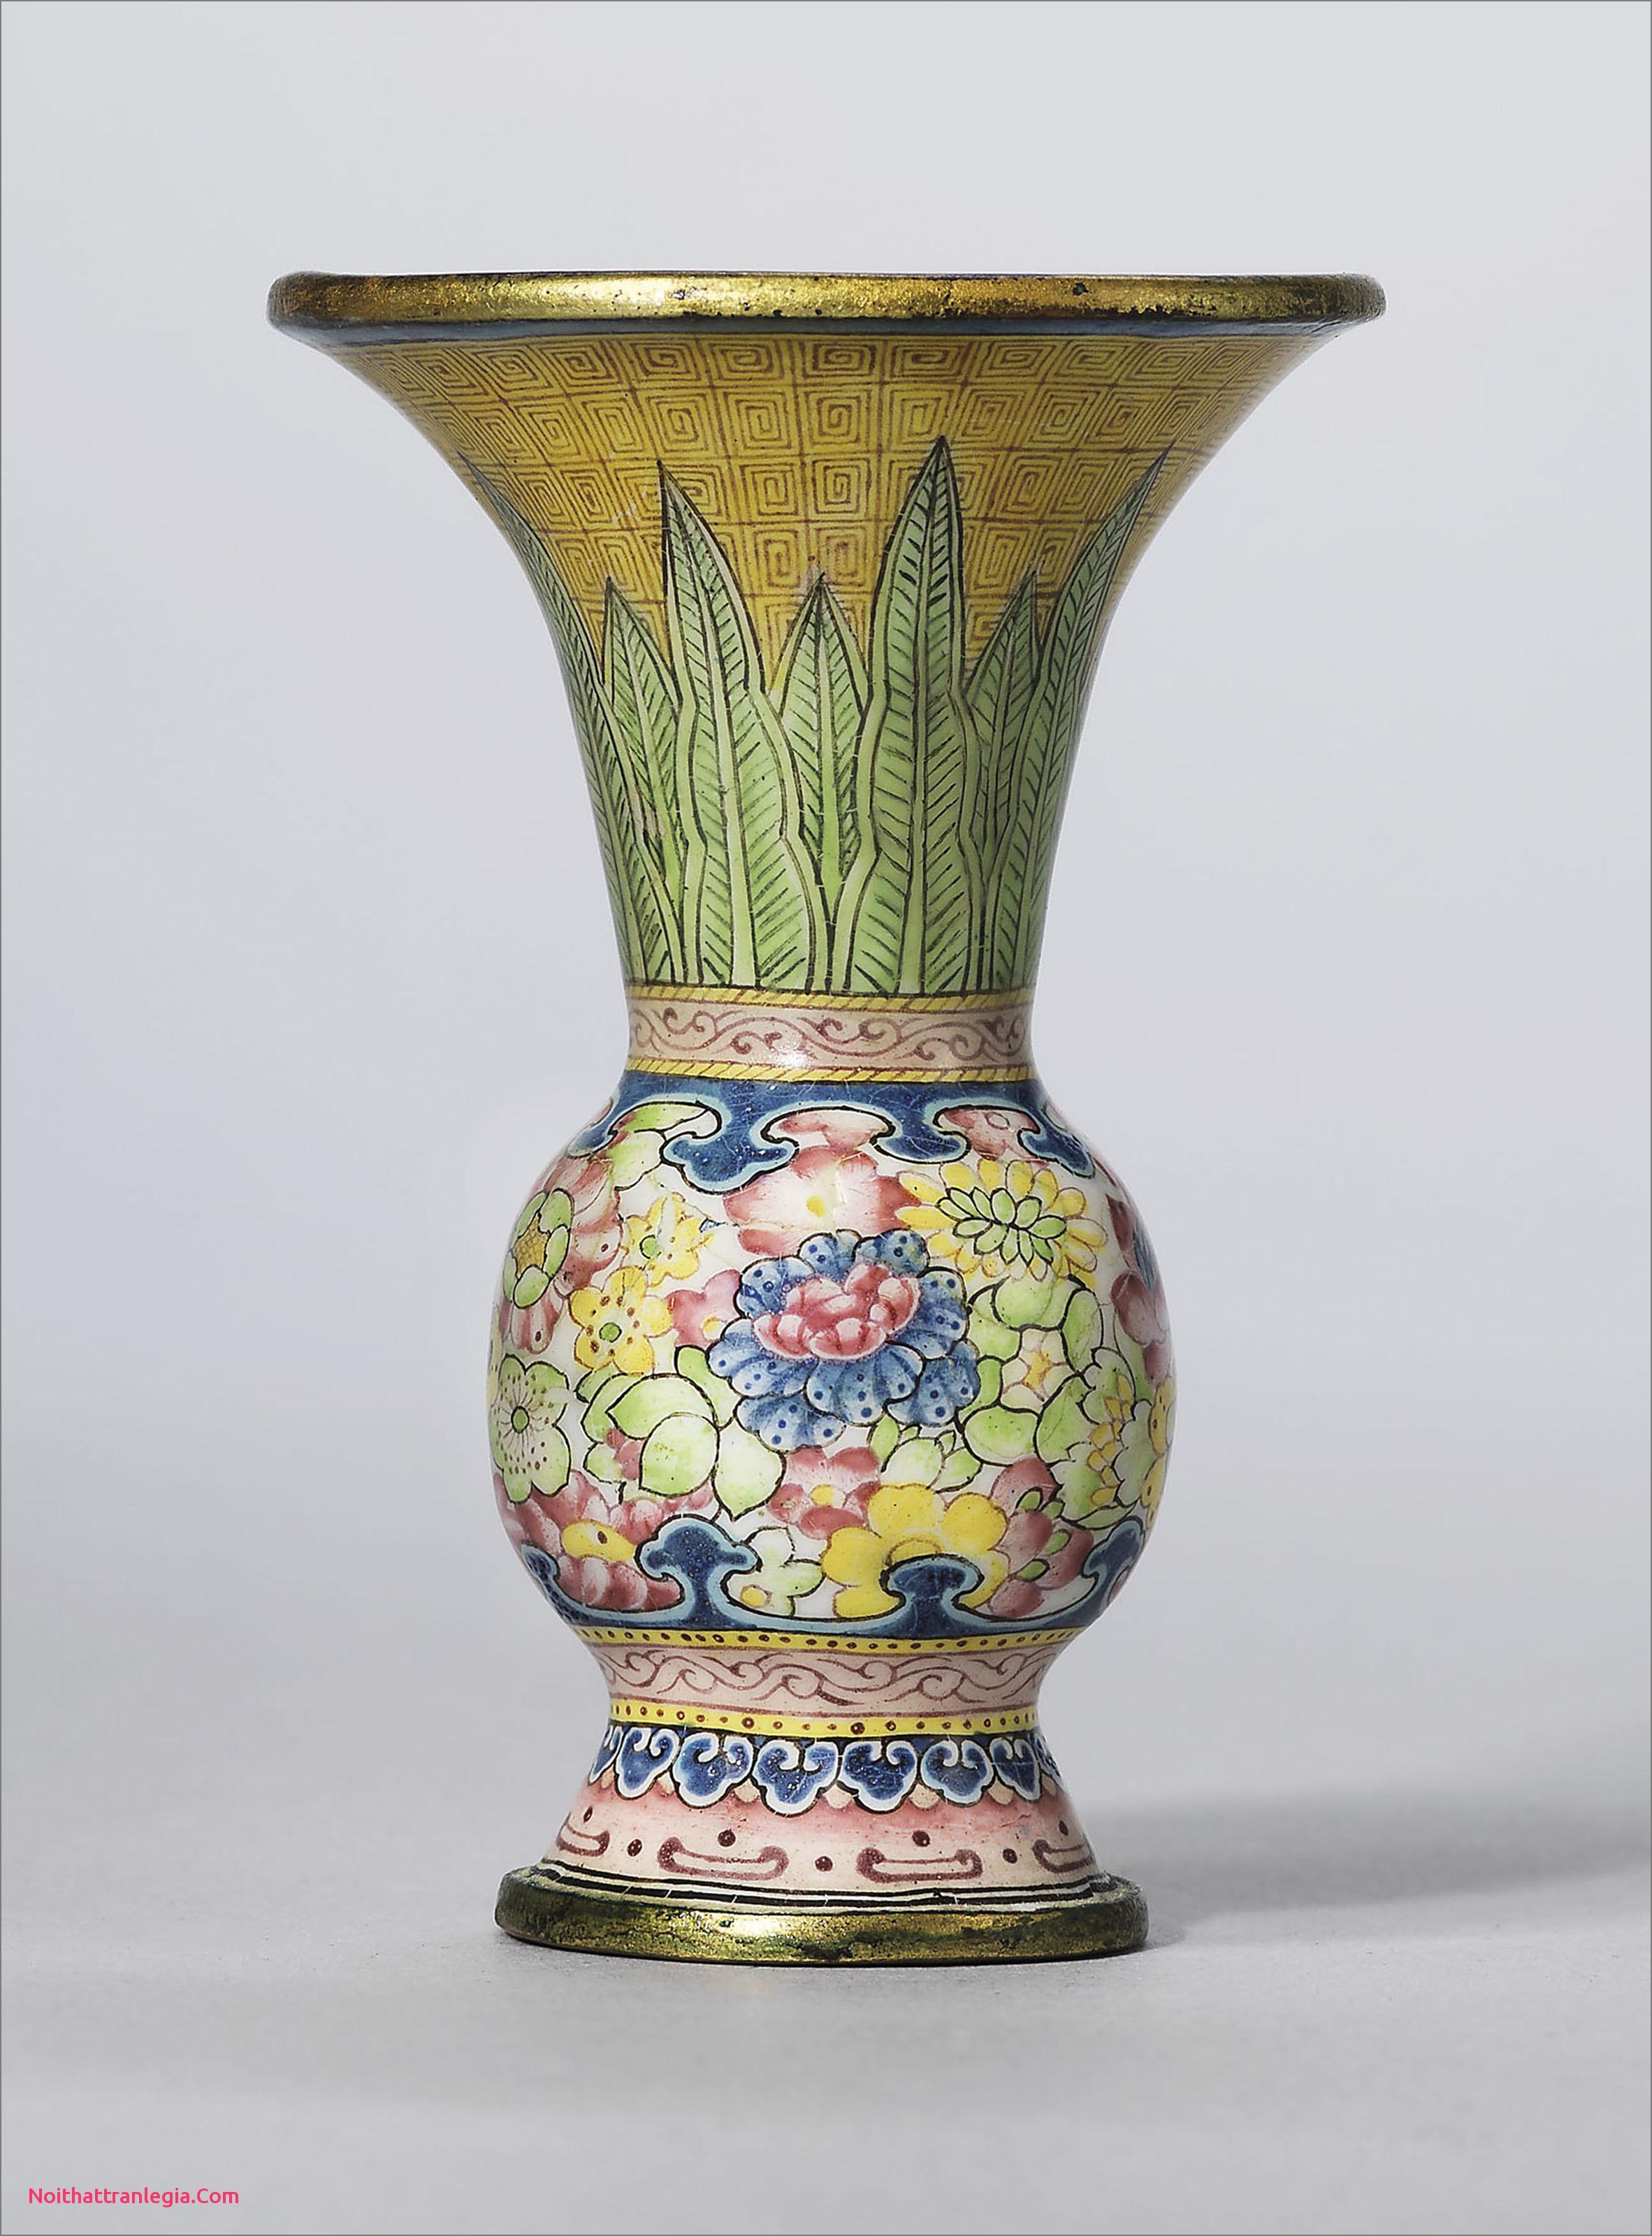 28 Stylish Blue White Ginger Jar Vases 2021 free download blue white ginger jar vases of 20 chinese antique vase noithattranlegia vases design intended for a rare painted enamel gu shaped miniature vase qianlong four character mark in